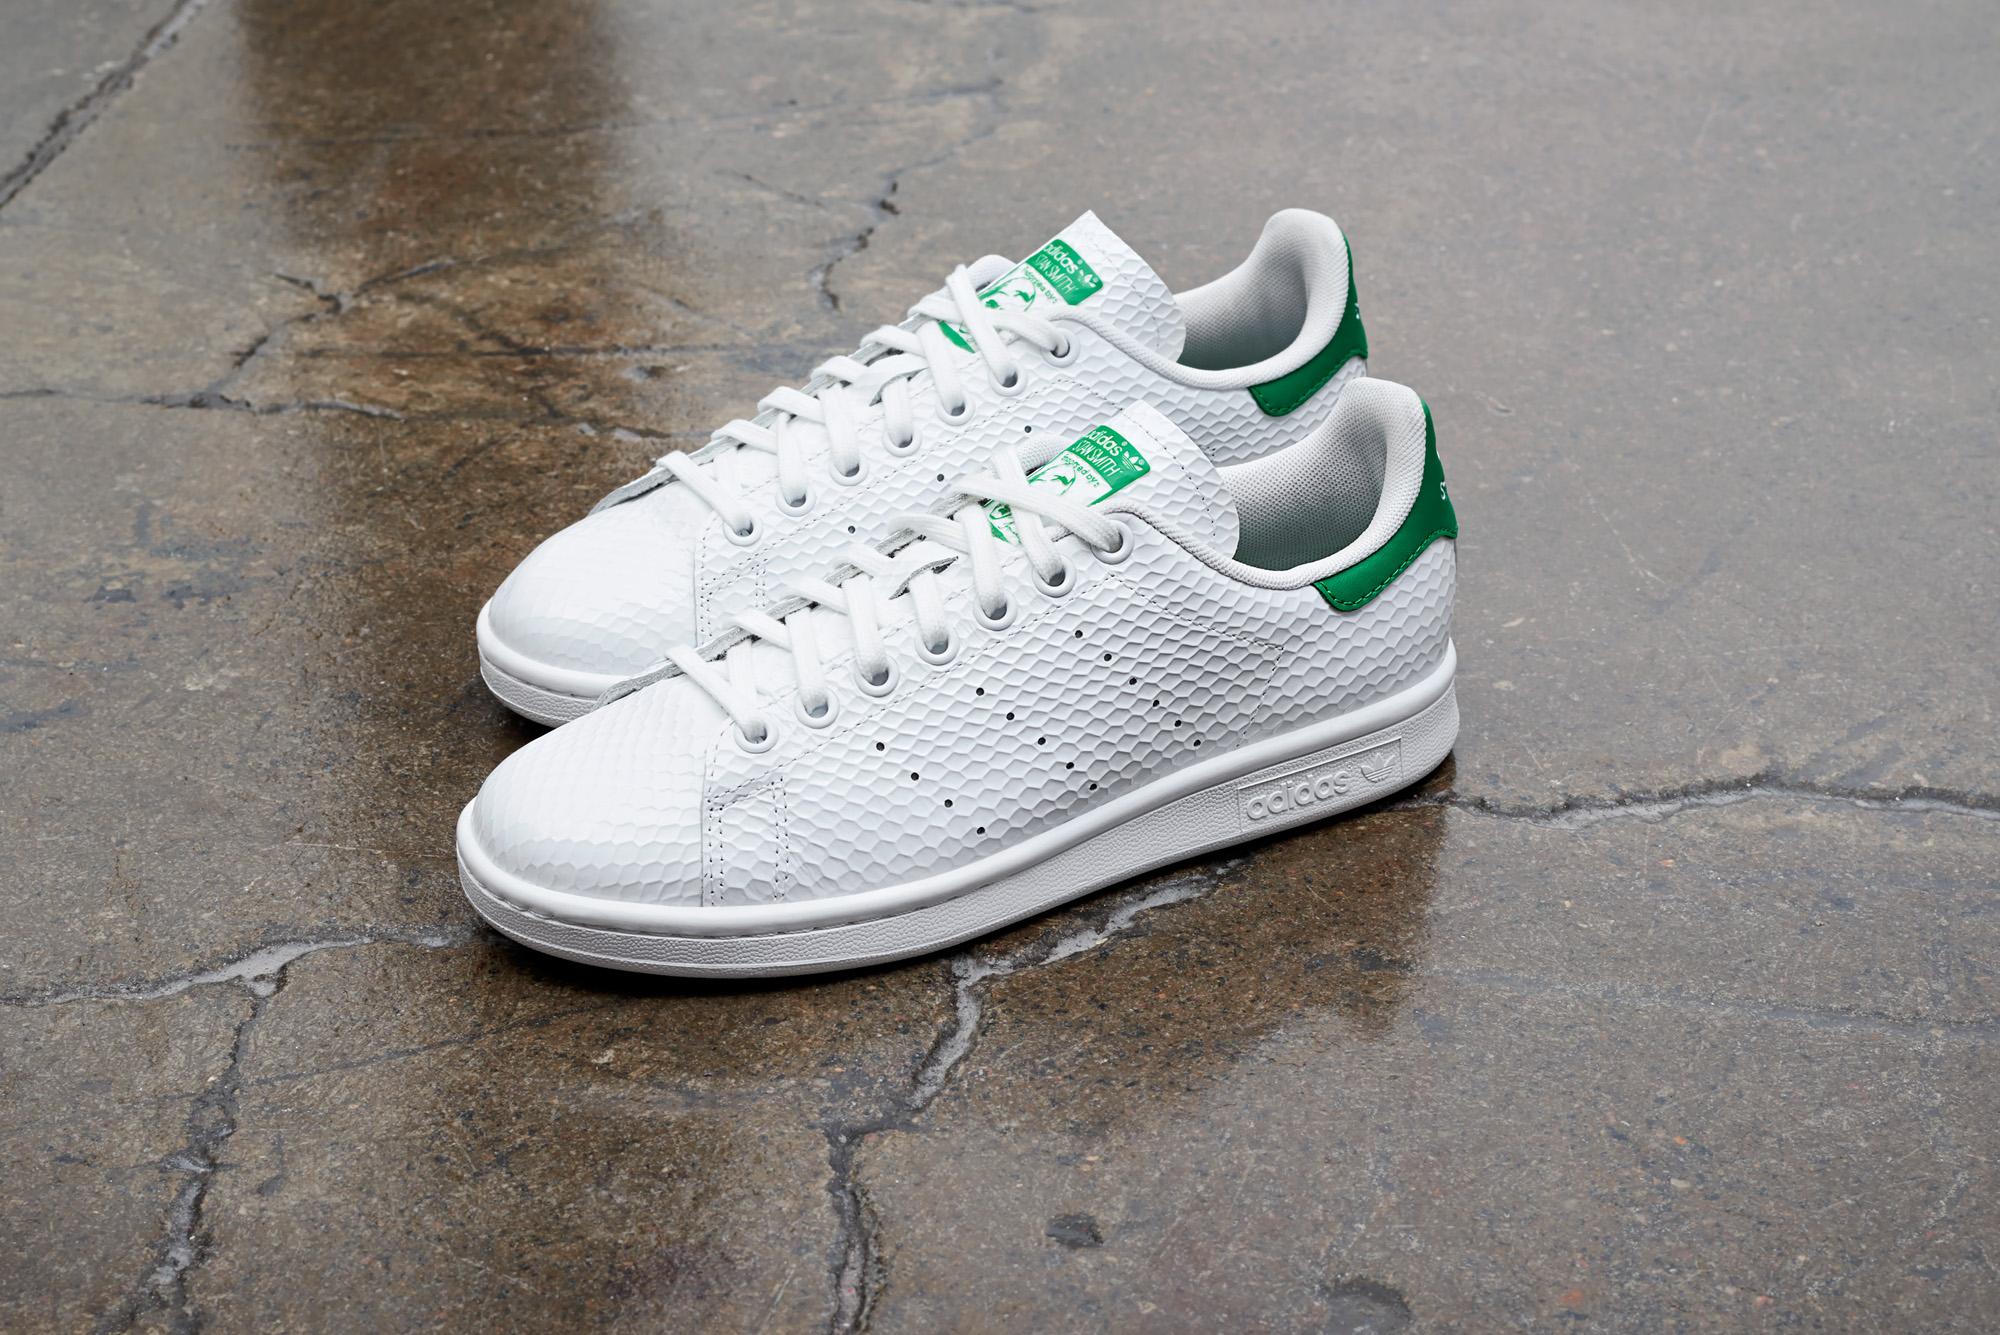 Adidas Stan Smith Tennis Shoes